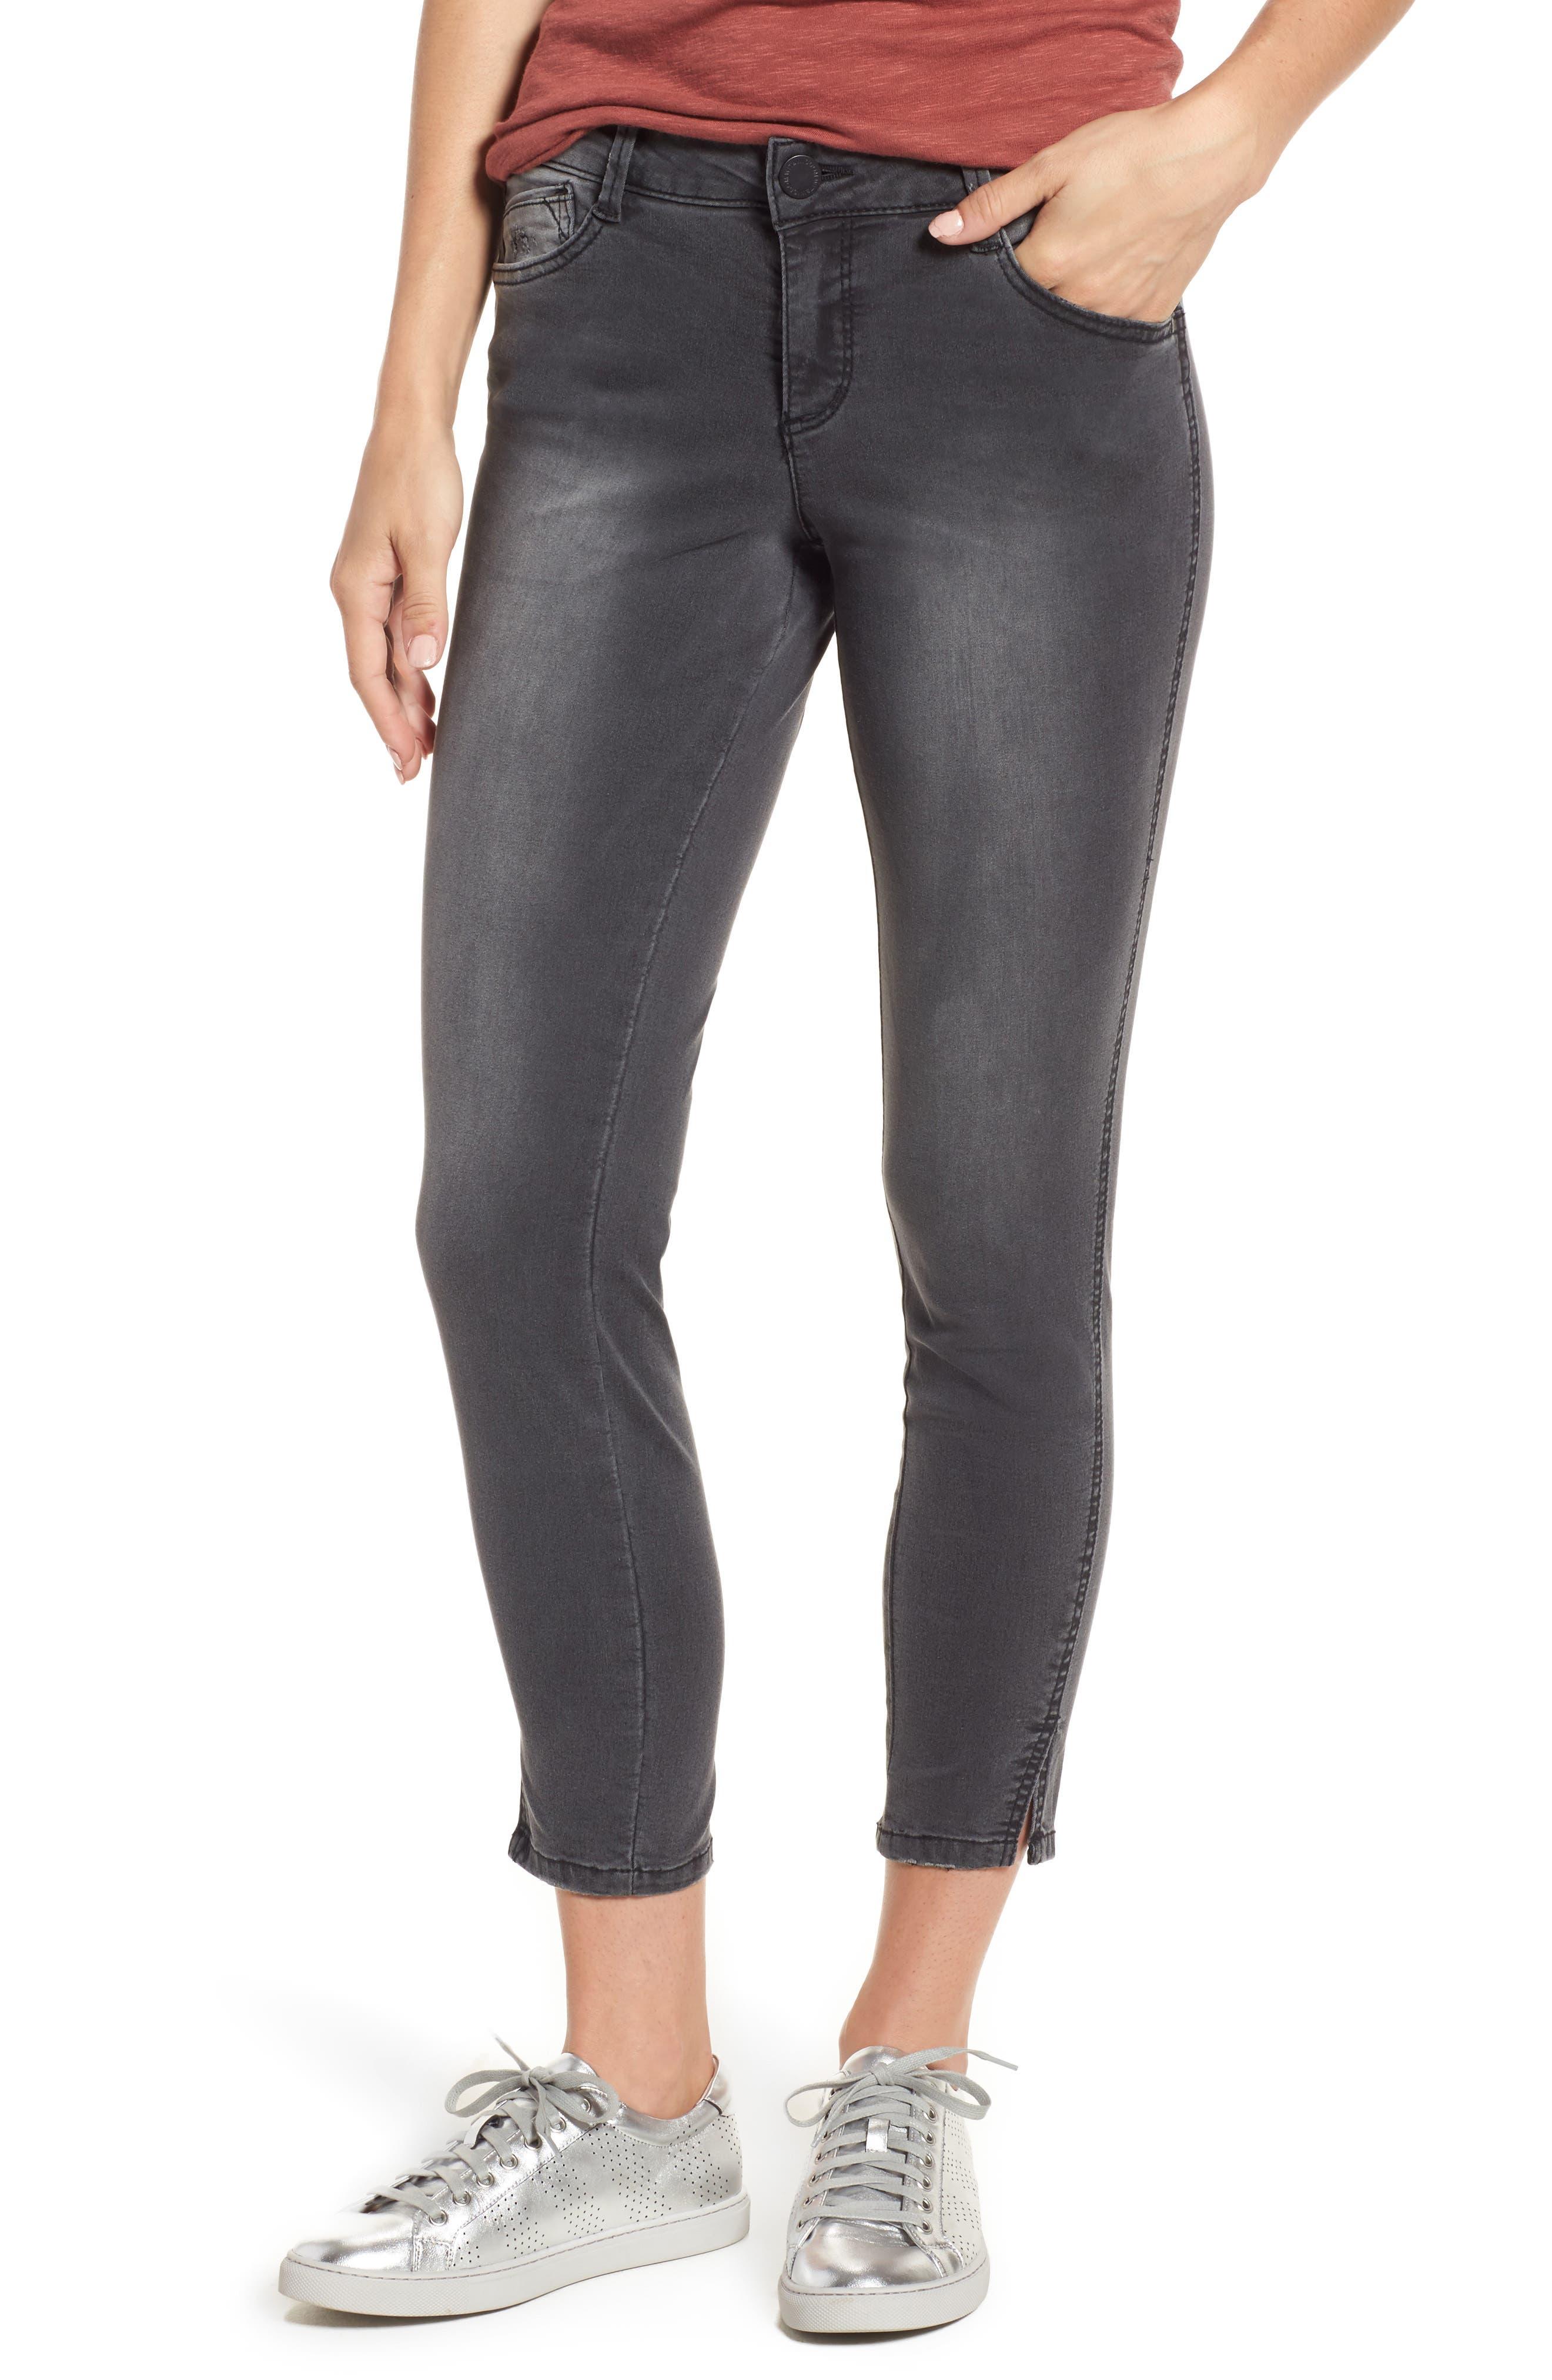 Main Image - Wit & Wisdom Slit Skinny Ankle Jeans (Nordstrom Exclusive) (Regular & Petite)